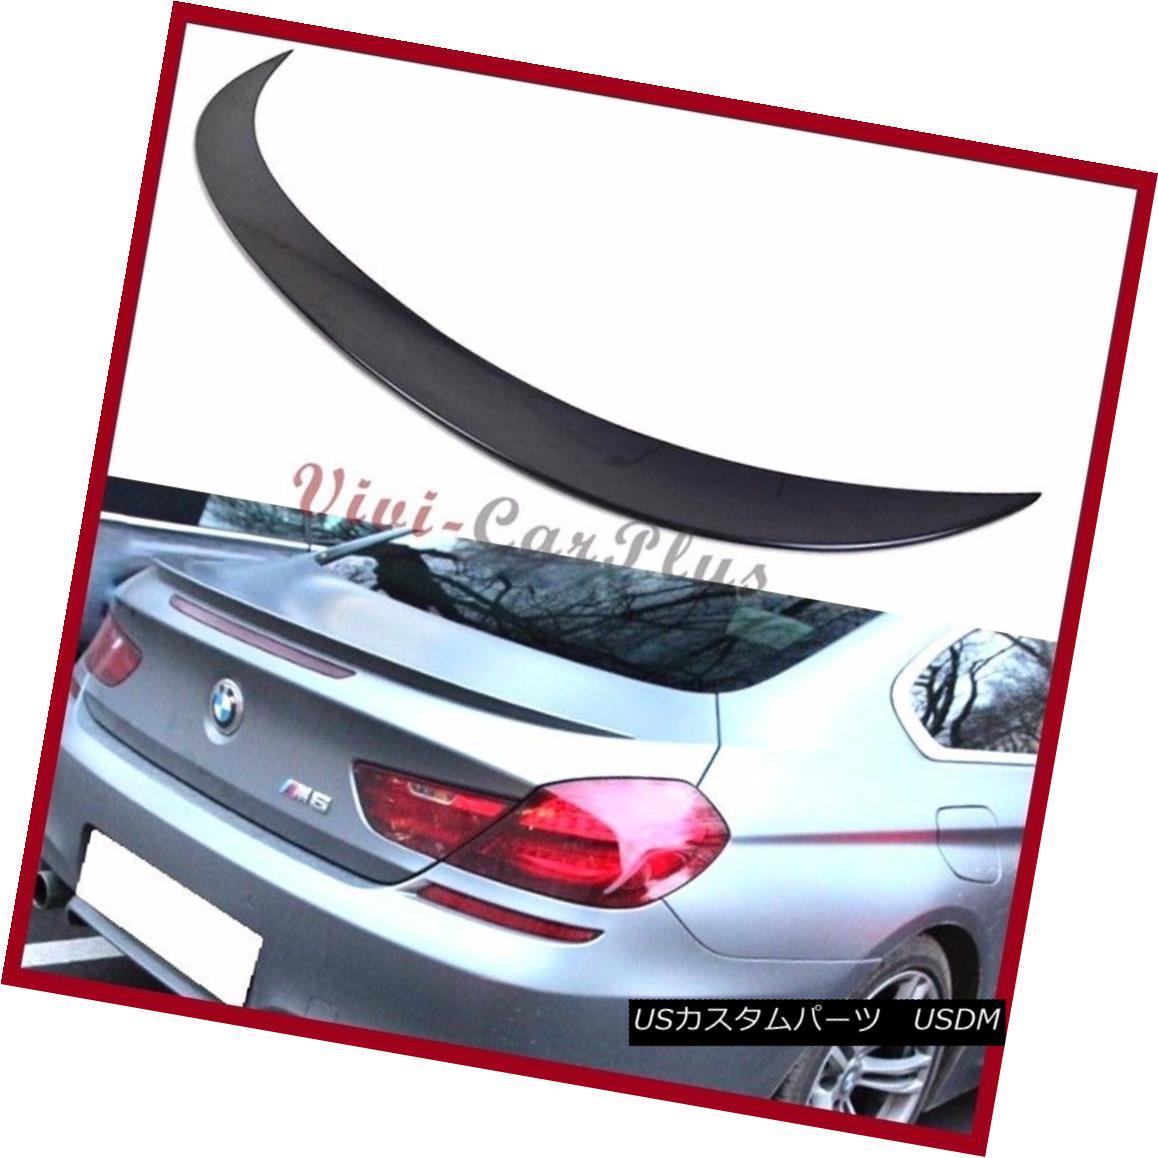 <title>車用品 バイク用品 >> パーツ 外装 エアロパーツ リアスポイラー おトク Pick Color 12-15 BMW F13 M6 Trunk Boot Rear Spoiler Wing For 640i 650i Coupe ピックカラー12-15 M6トランクブーツリアスポイラーウィングfor M6クーペ</title>